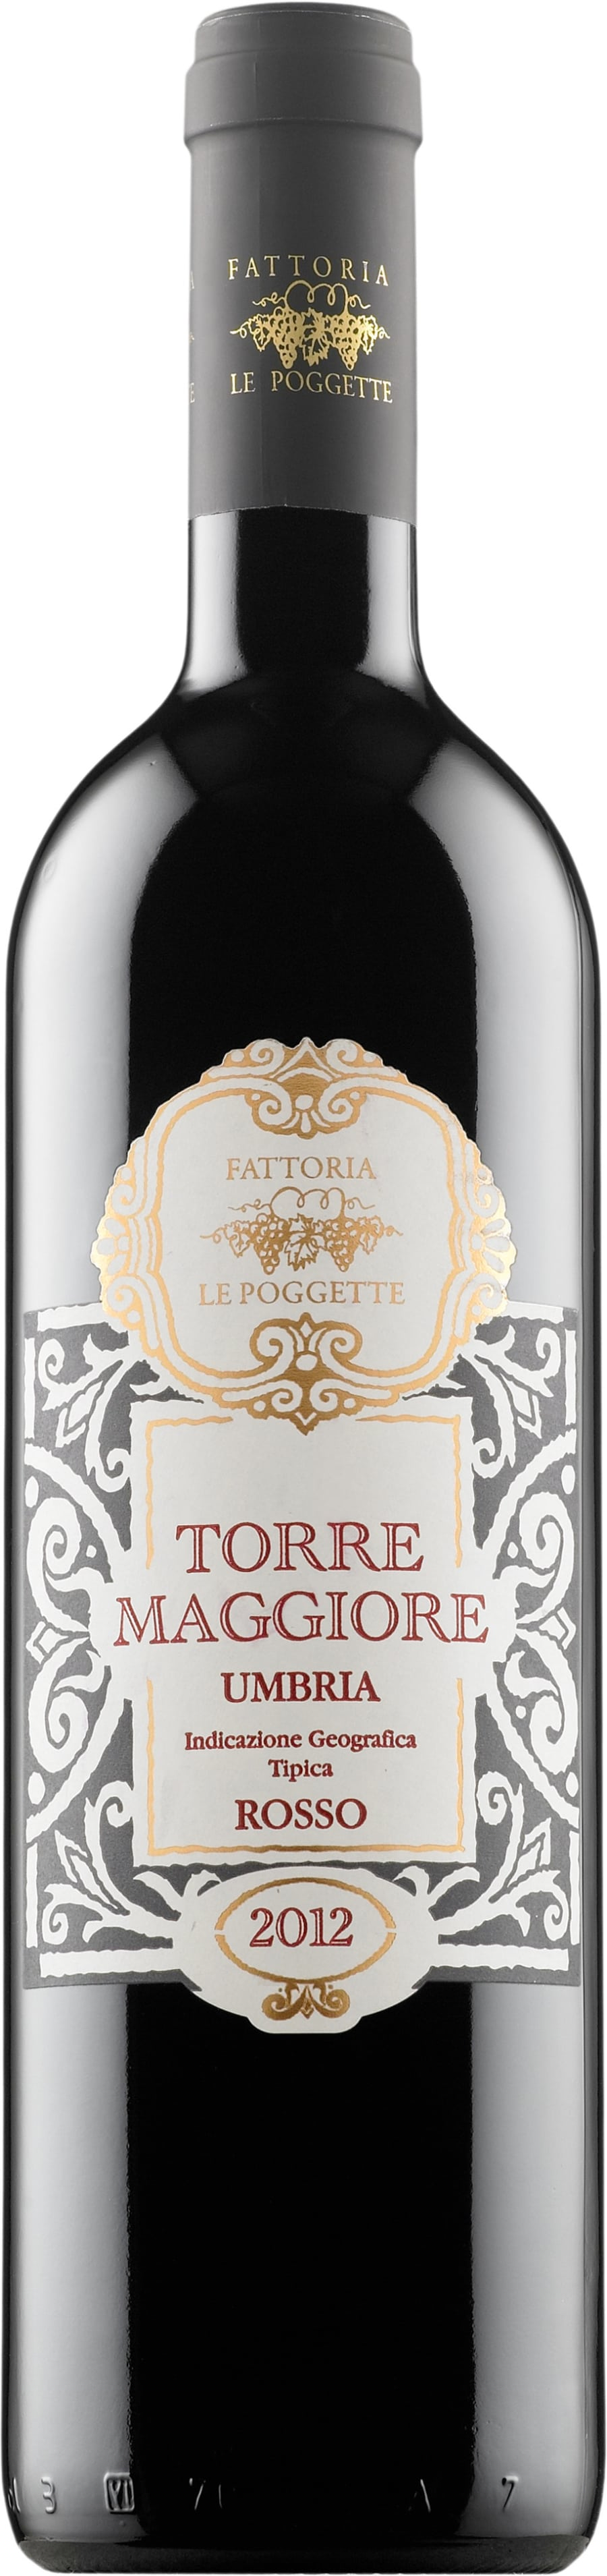 Vino rosso Torre Maggiore Umbria